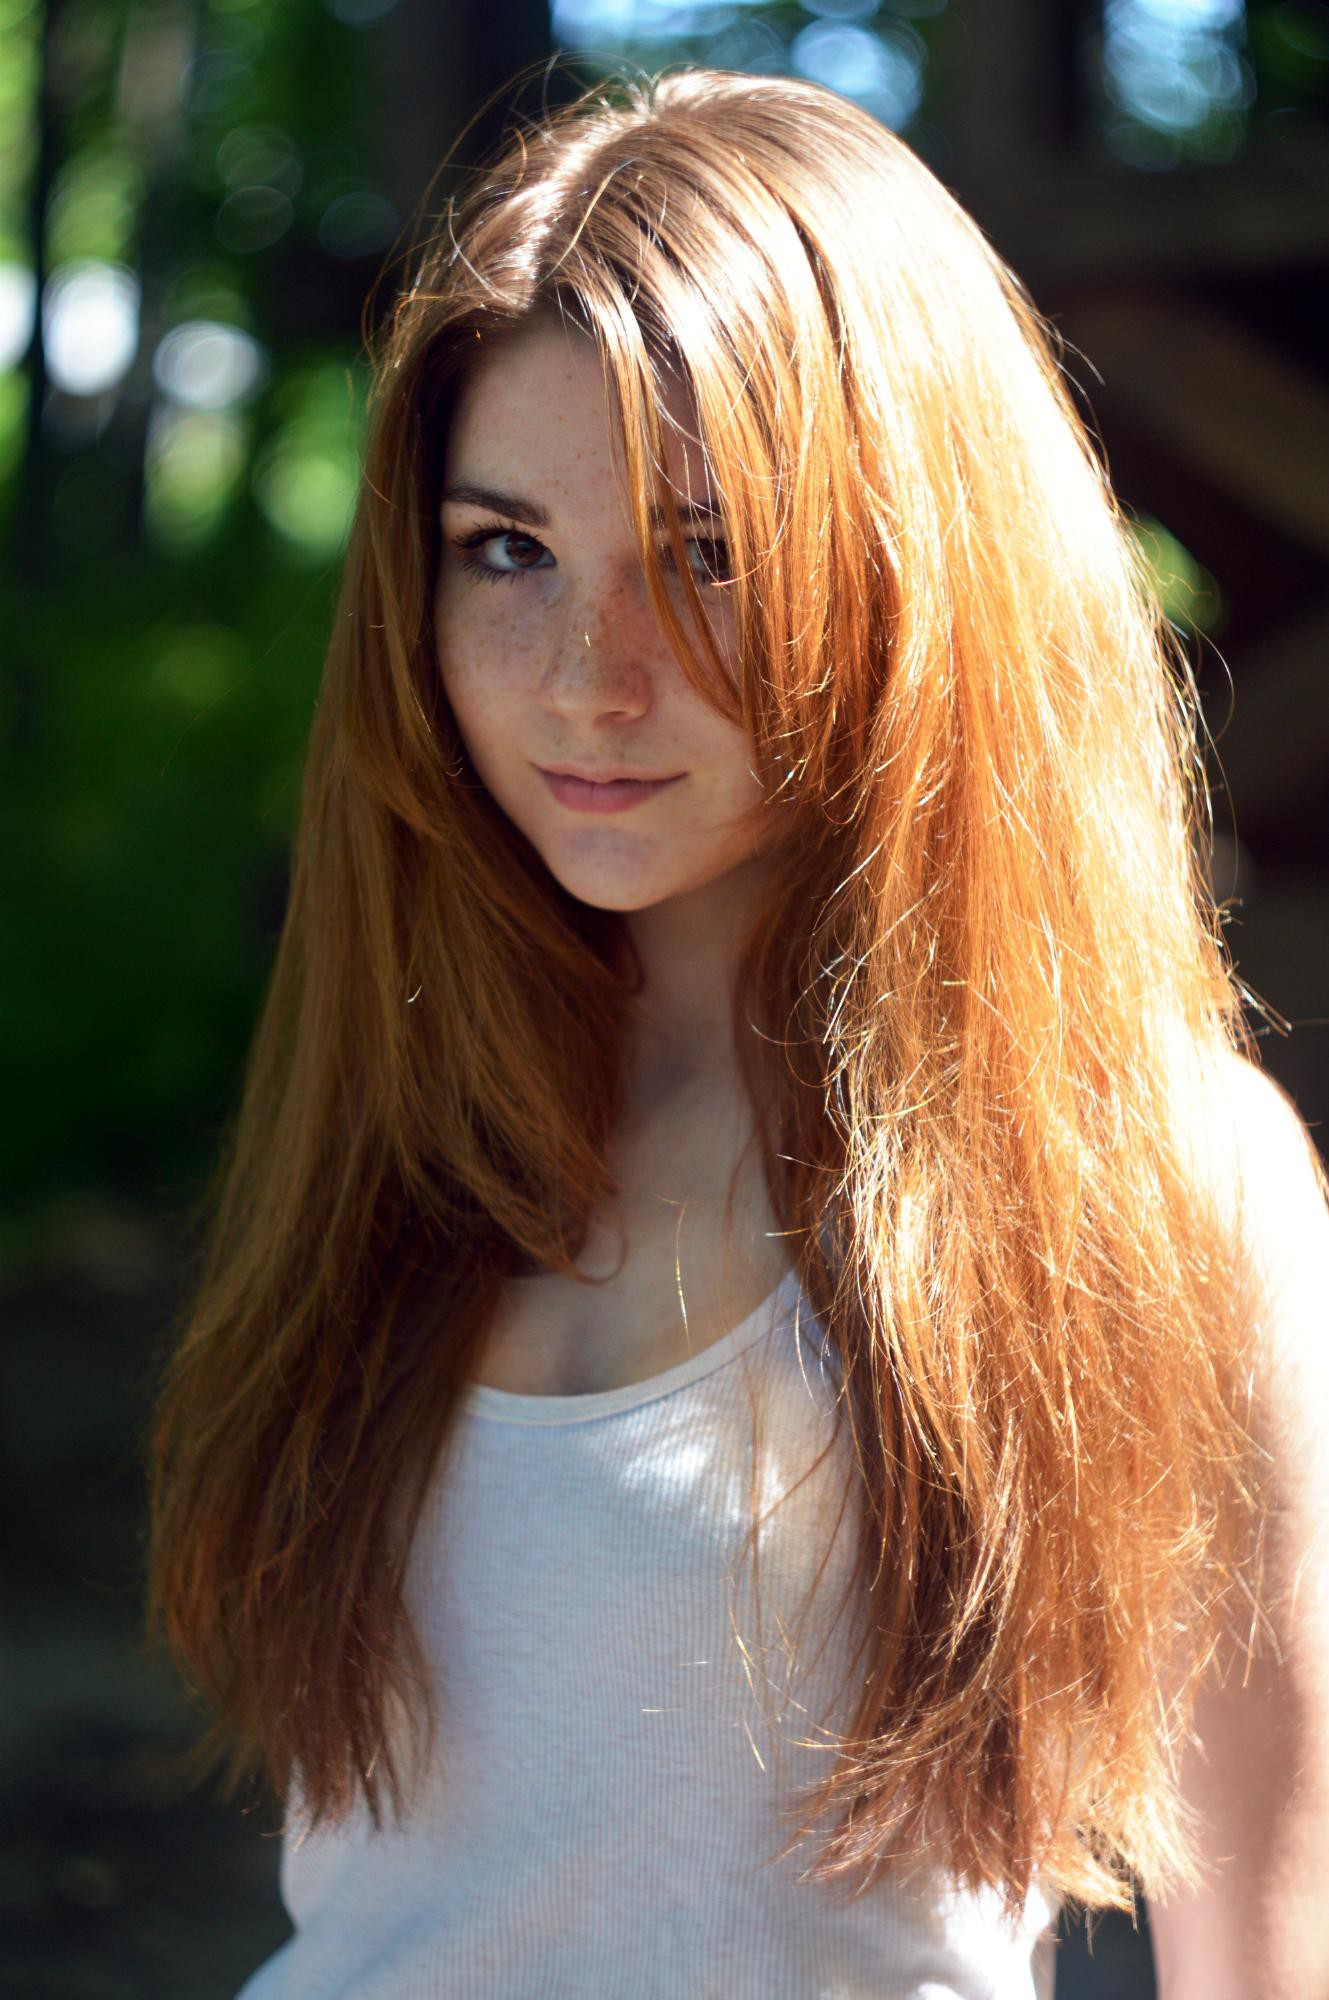 Lesbien ways young redhead girl girls